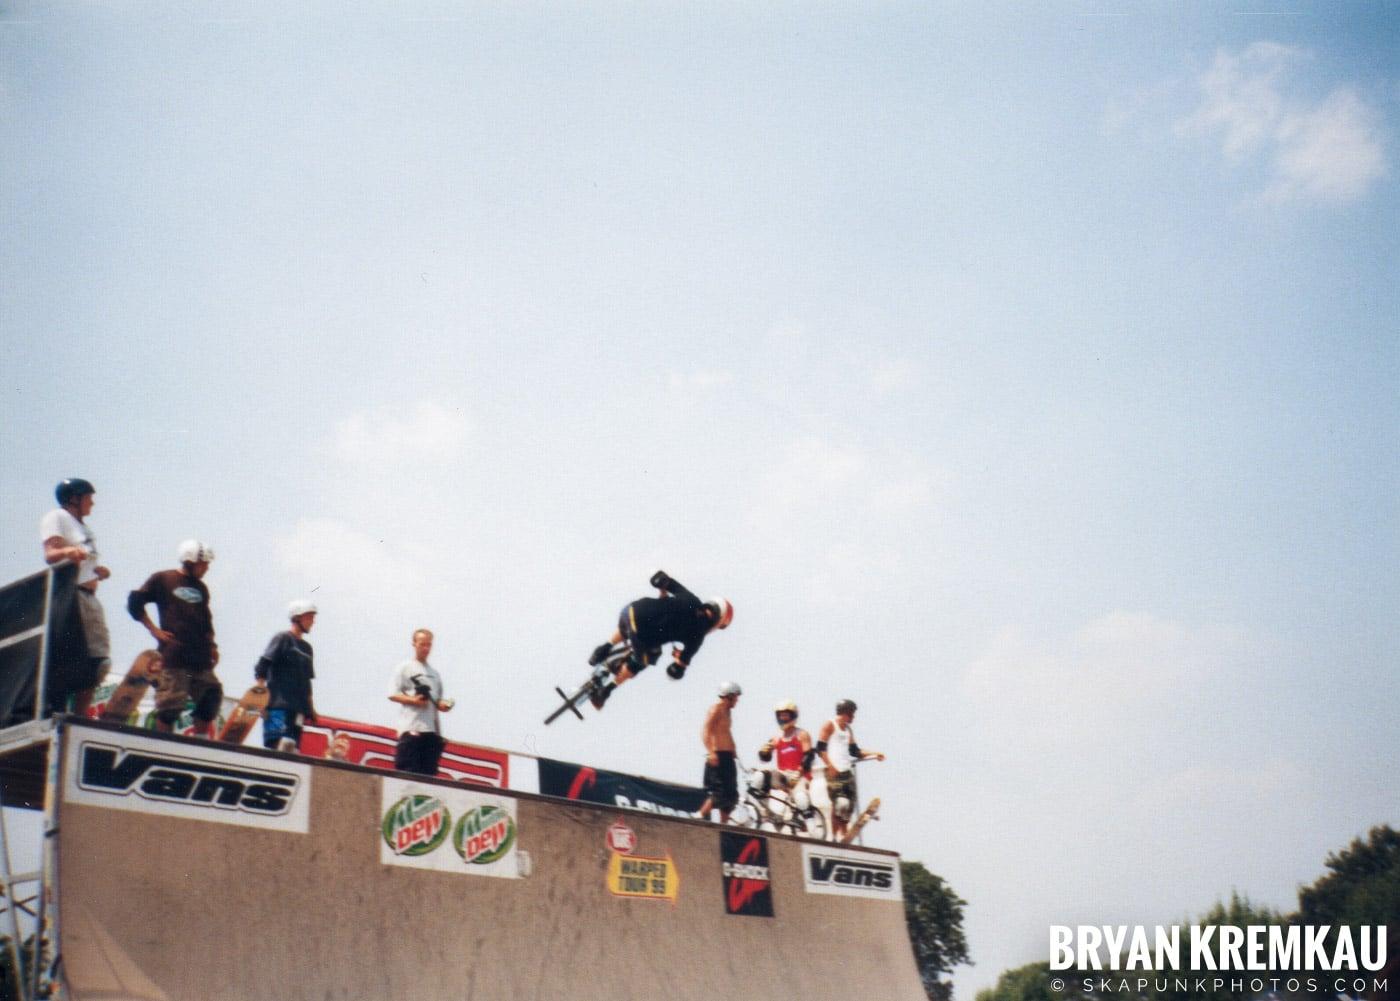 Skaters @ Vans Warped Tour, Randall's Island, NYC - 7.16.99 (14)